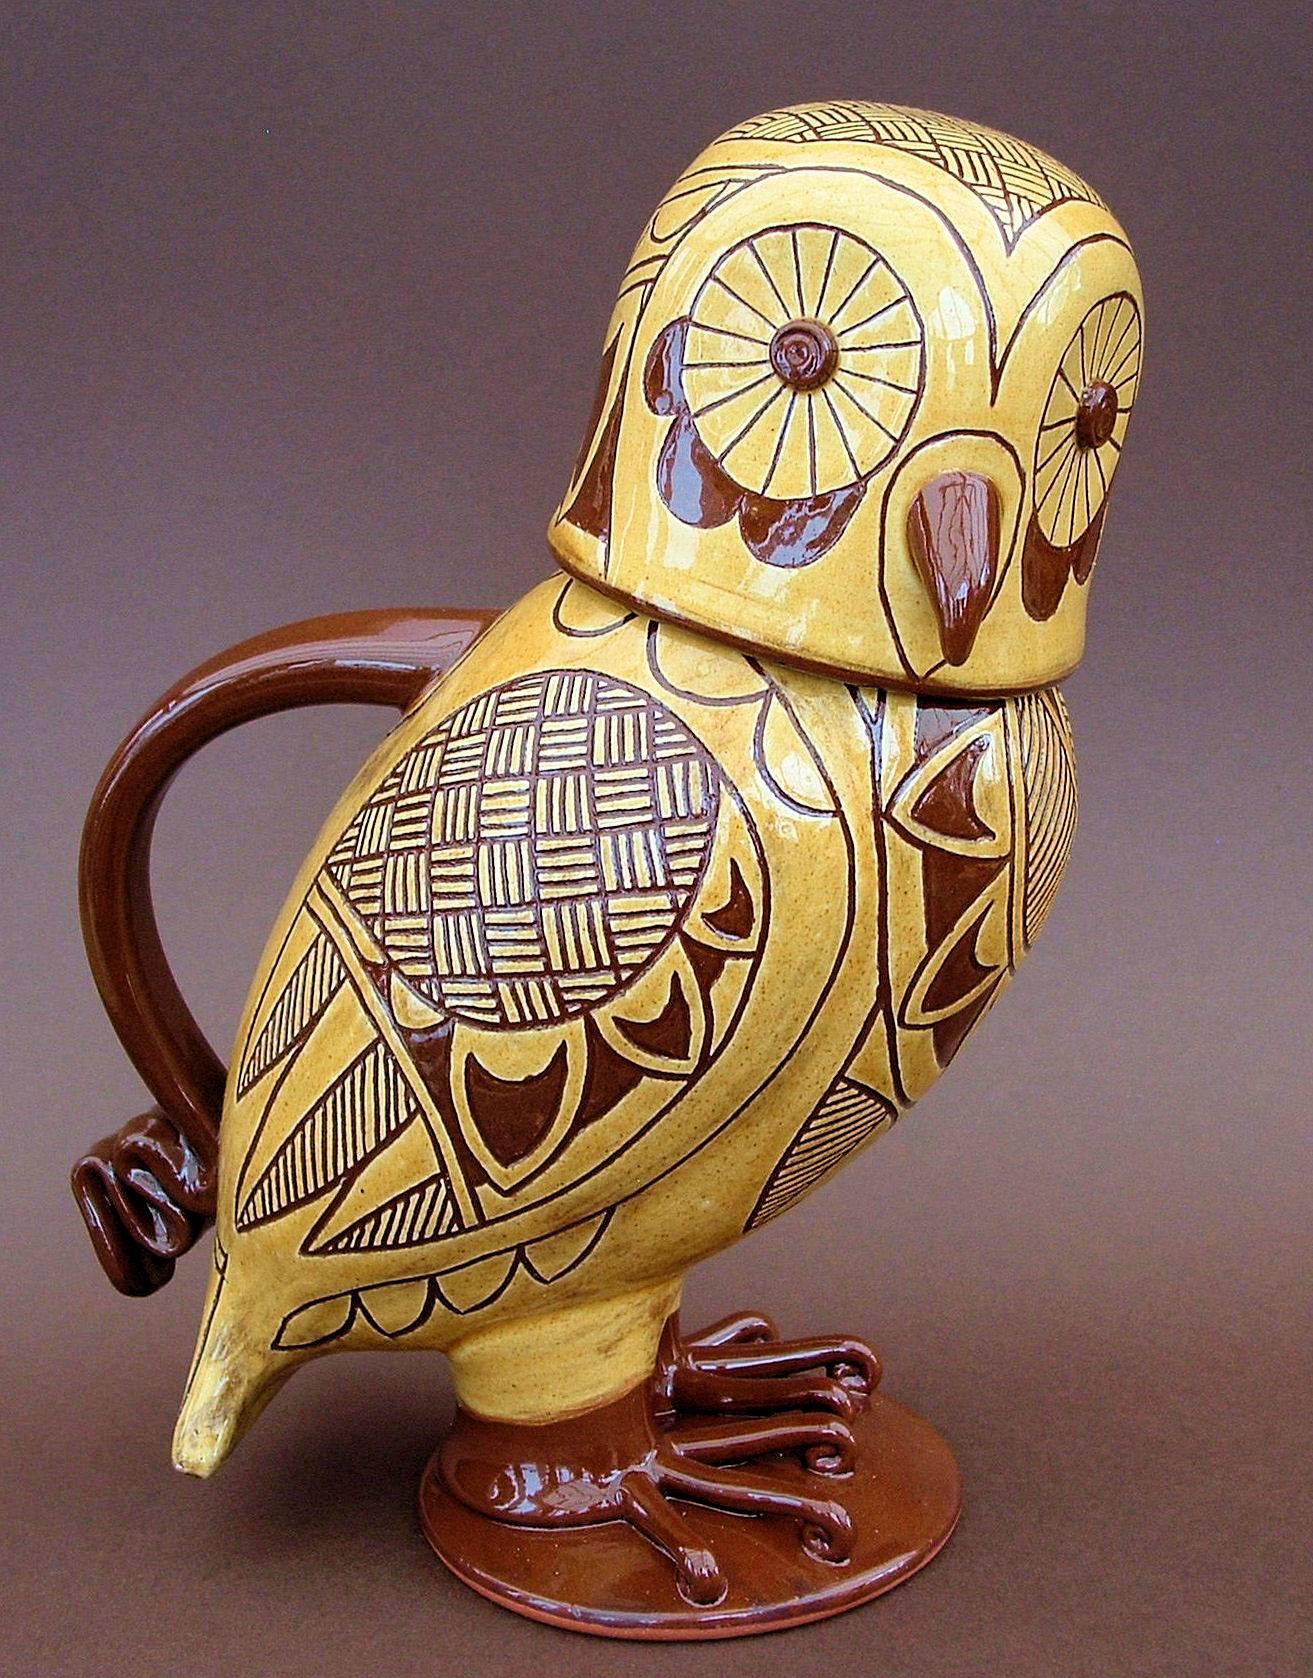 "2 Tone Lidded Owl Jug 10"" tall"